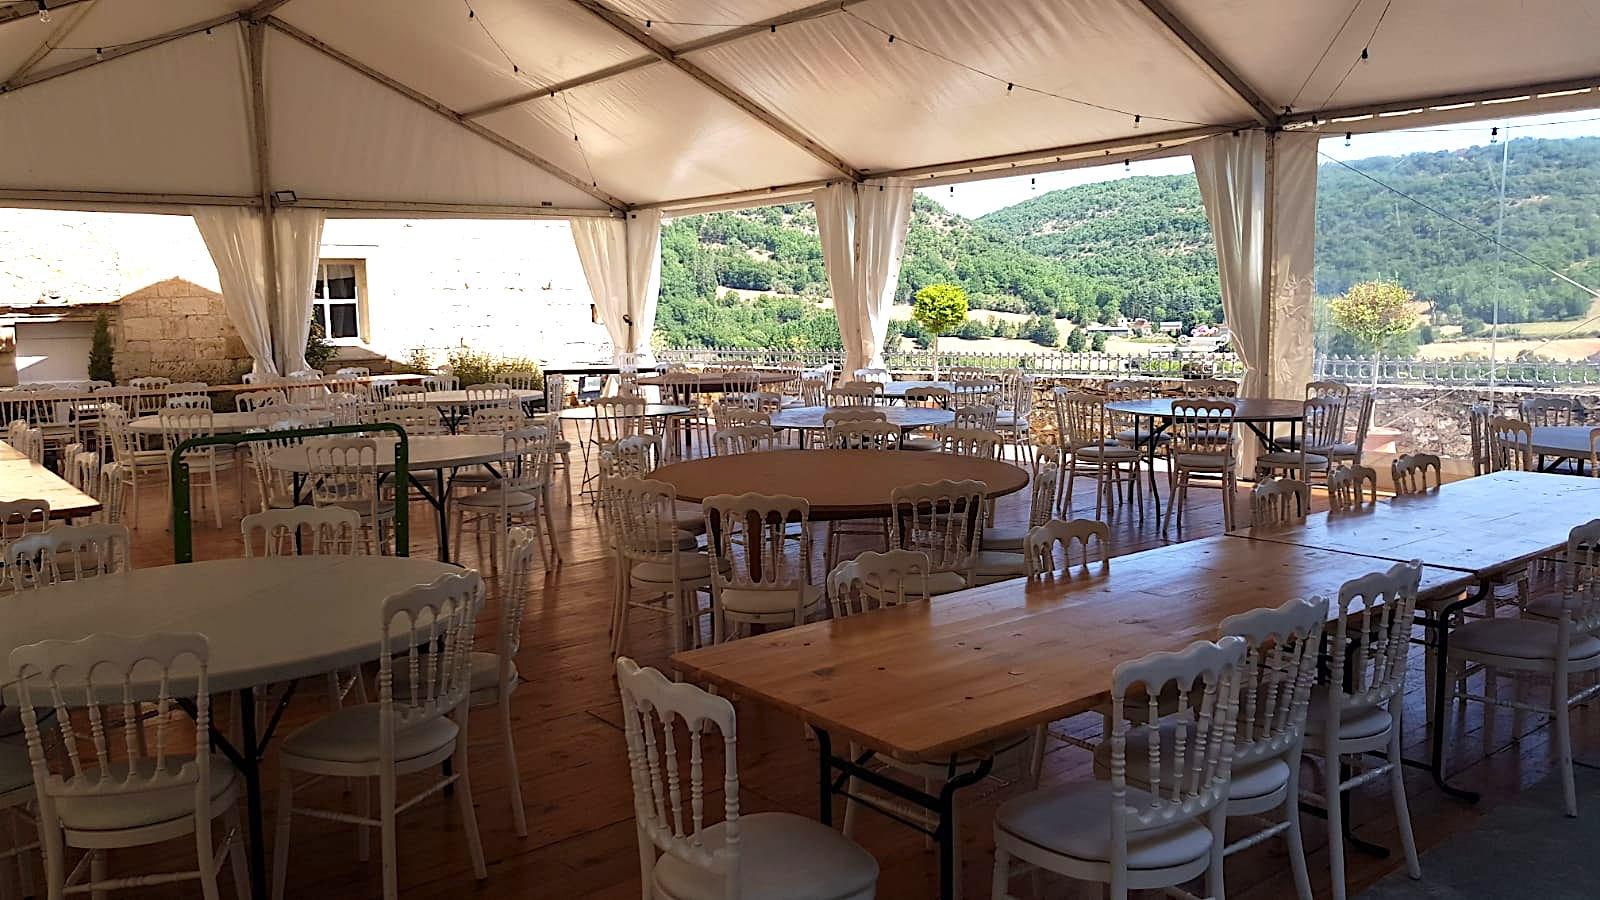 location chapiteau chateau mariage